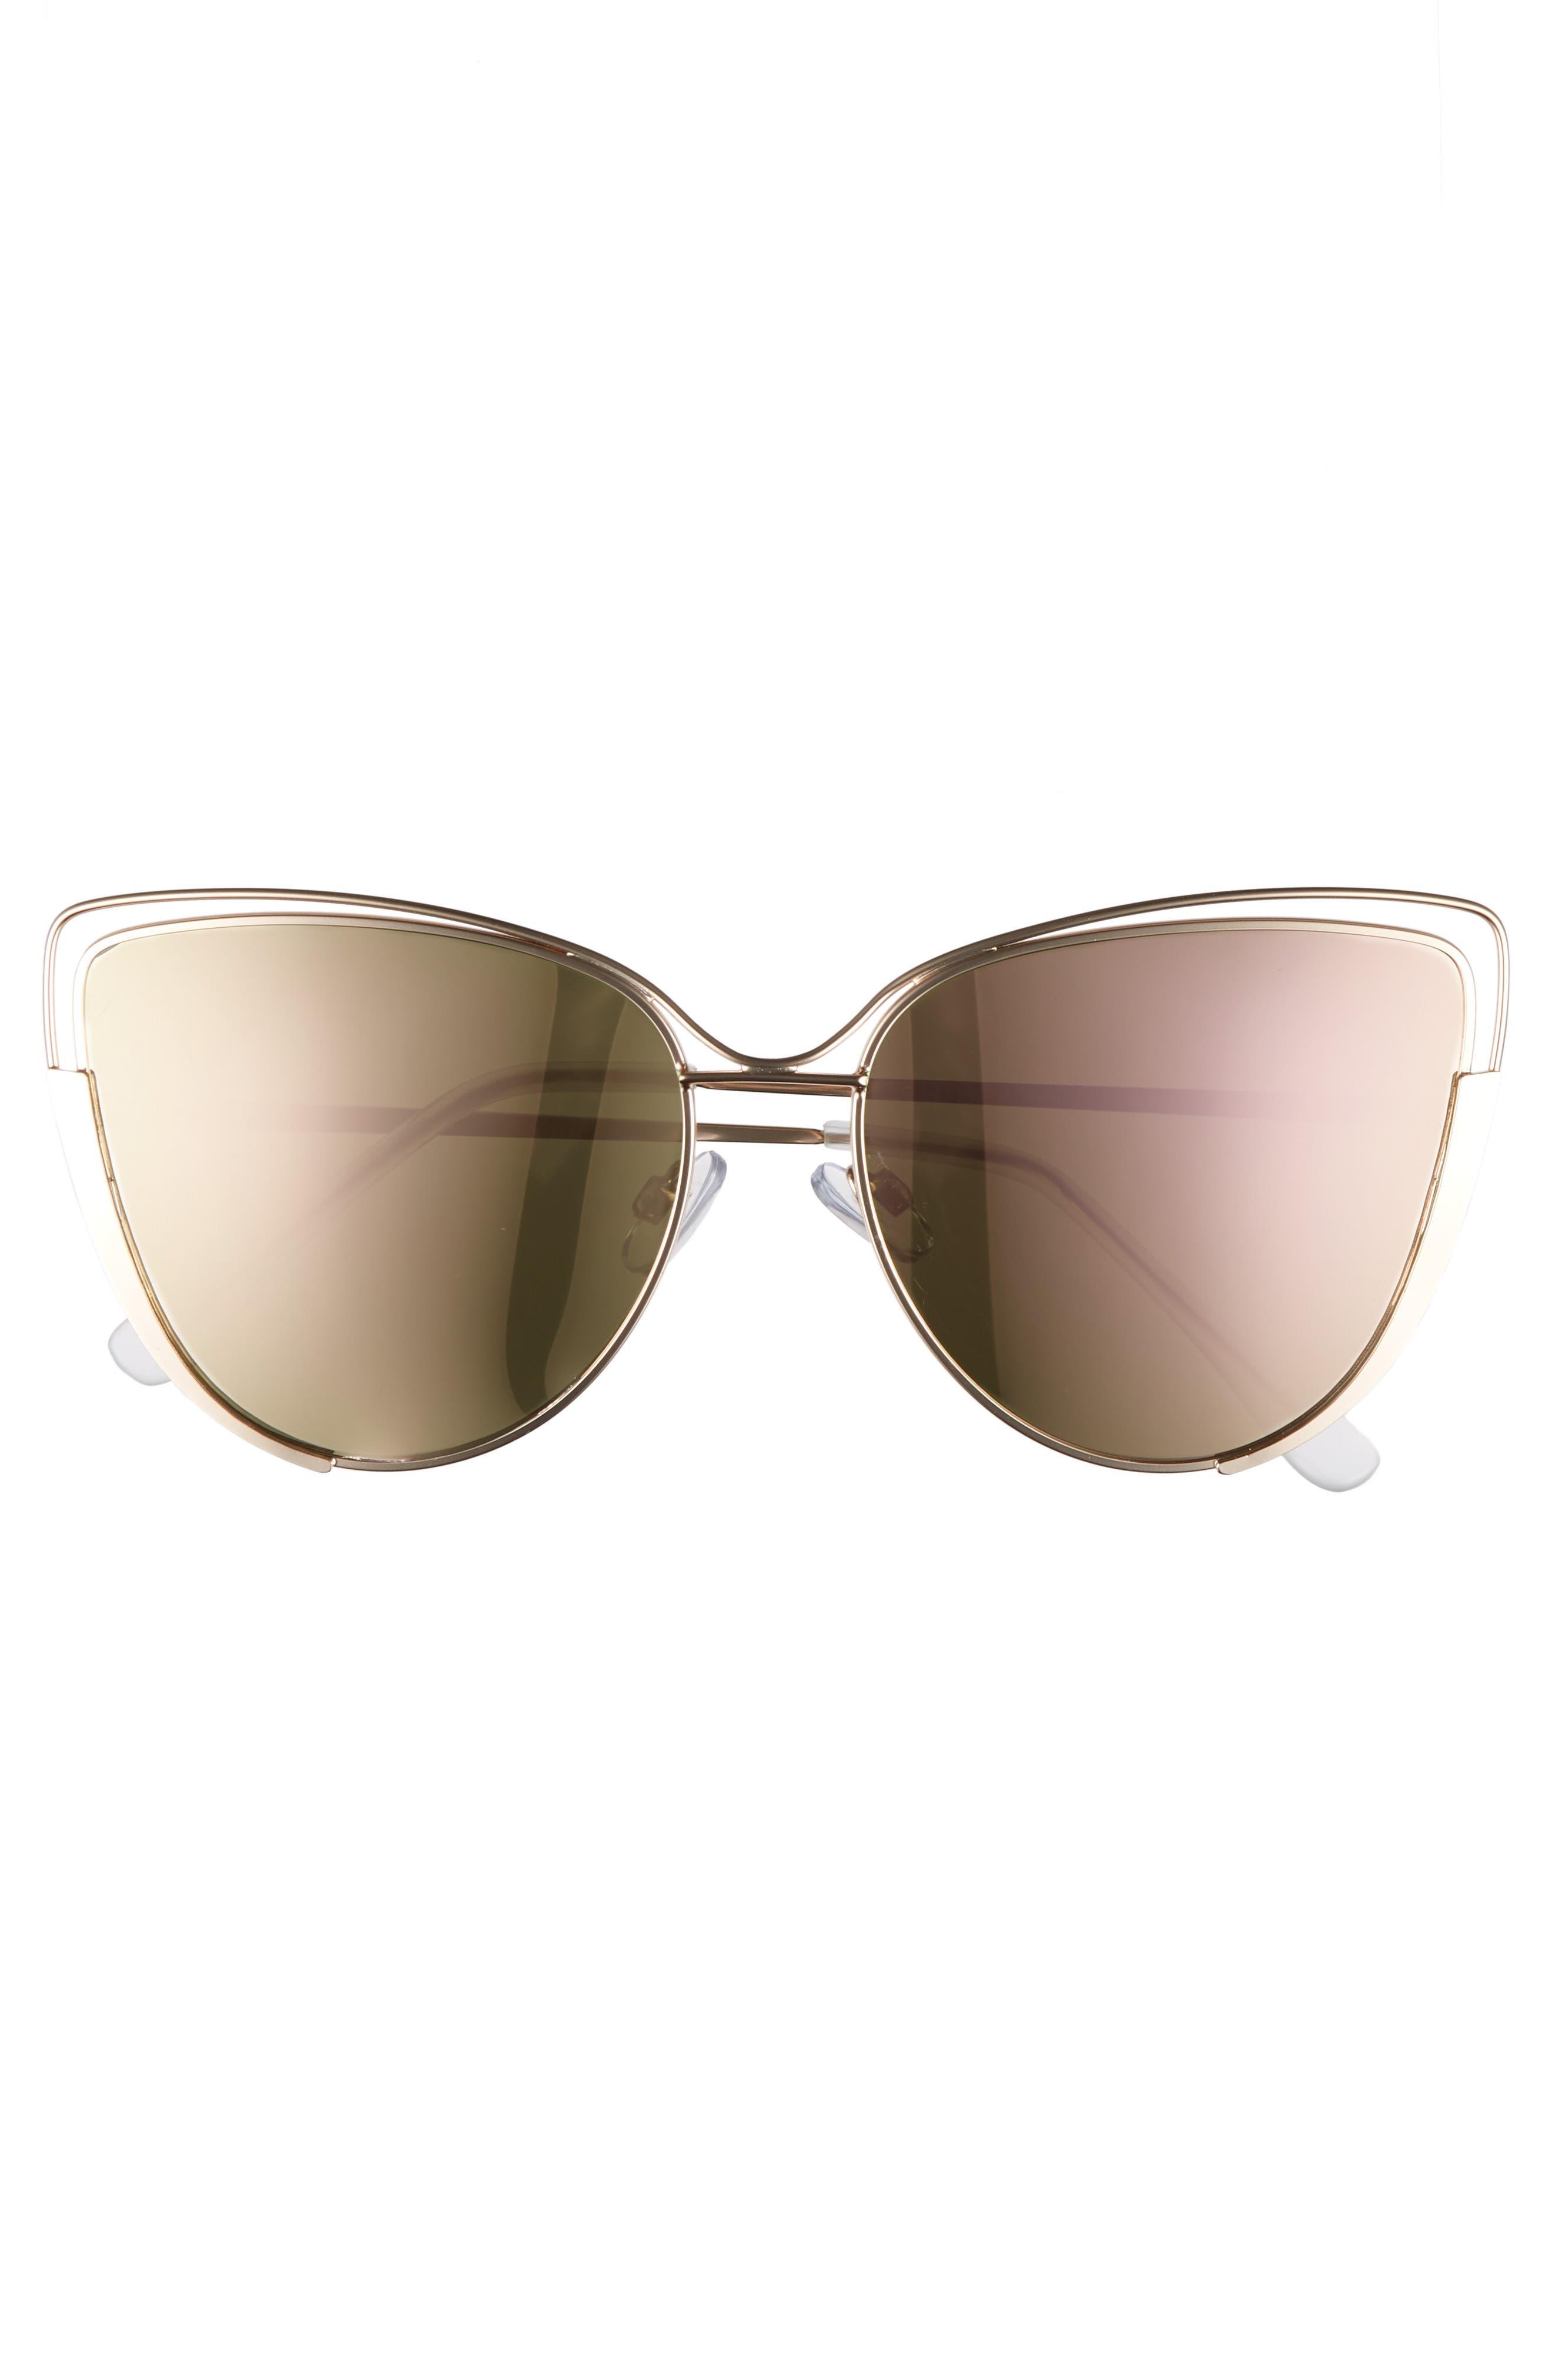 Futuristic Cat Eye Sunglasses,                             Alternate thumbnail 3, color,                             Gold